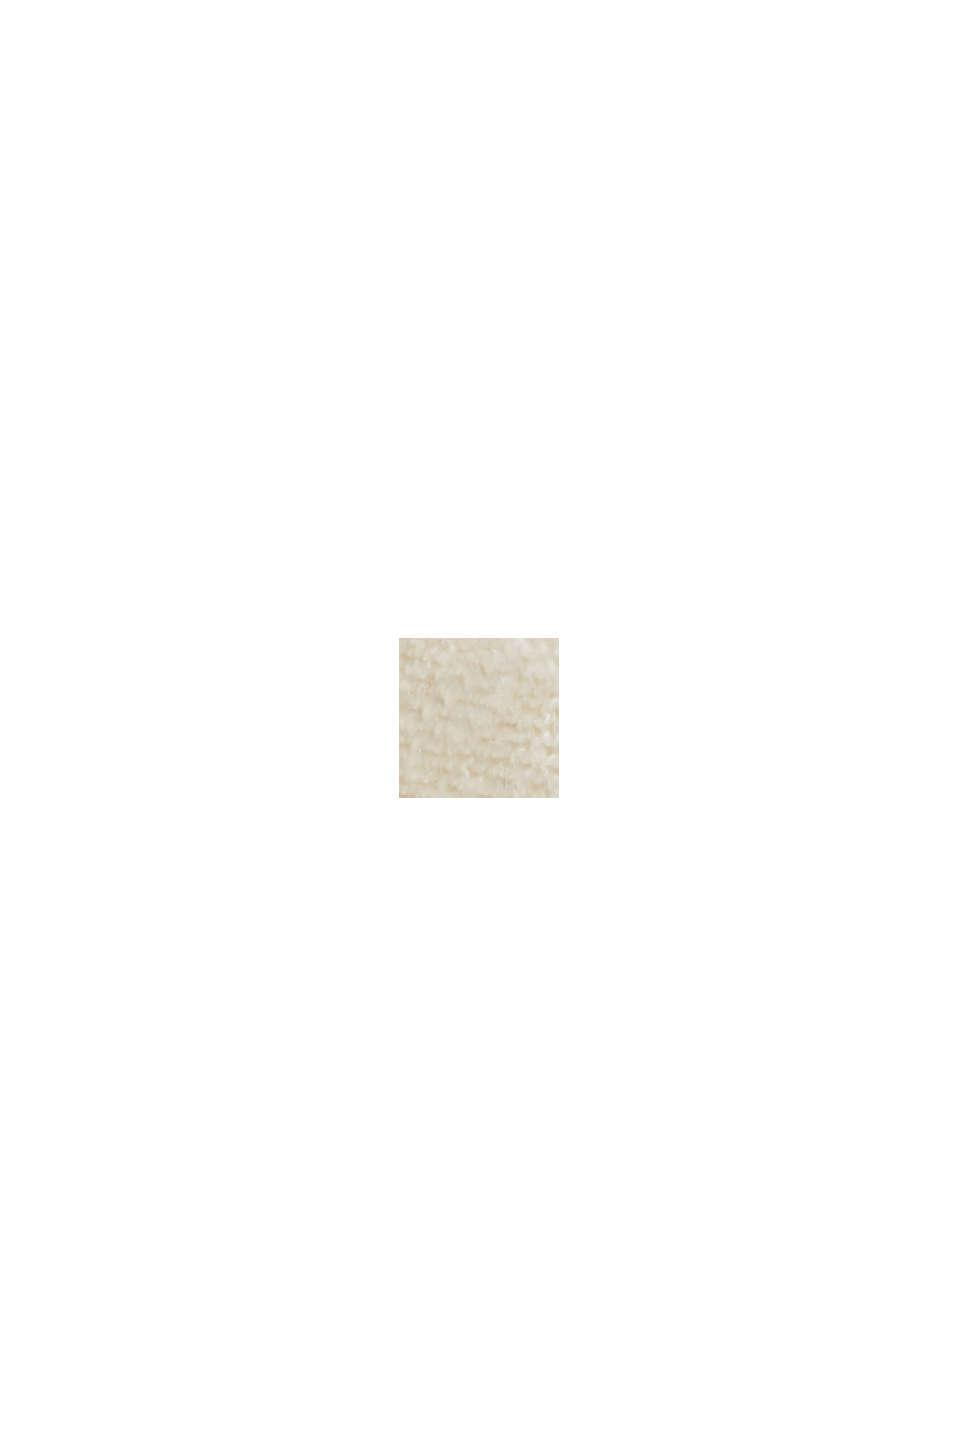 Jersey con textura, 100 % algodón ecológico, OFF WHITE, swatch